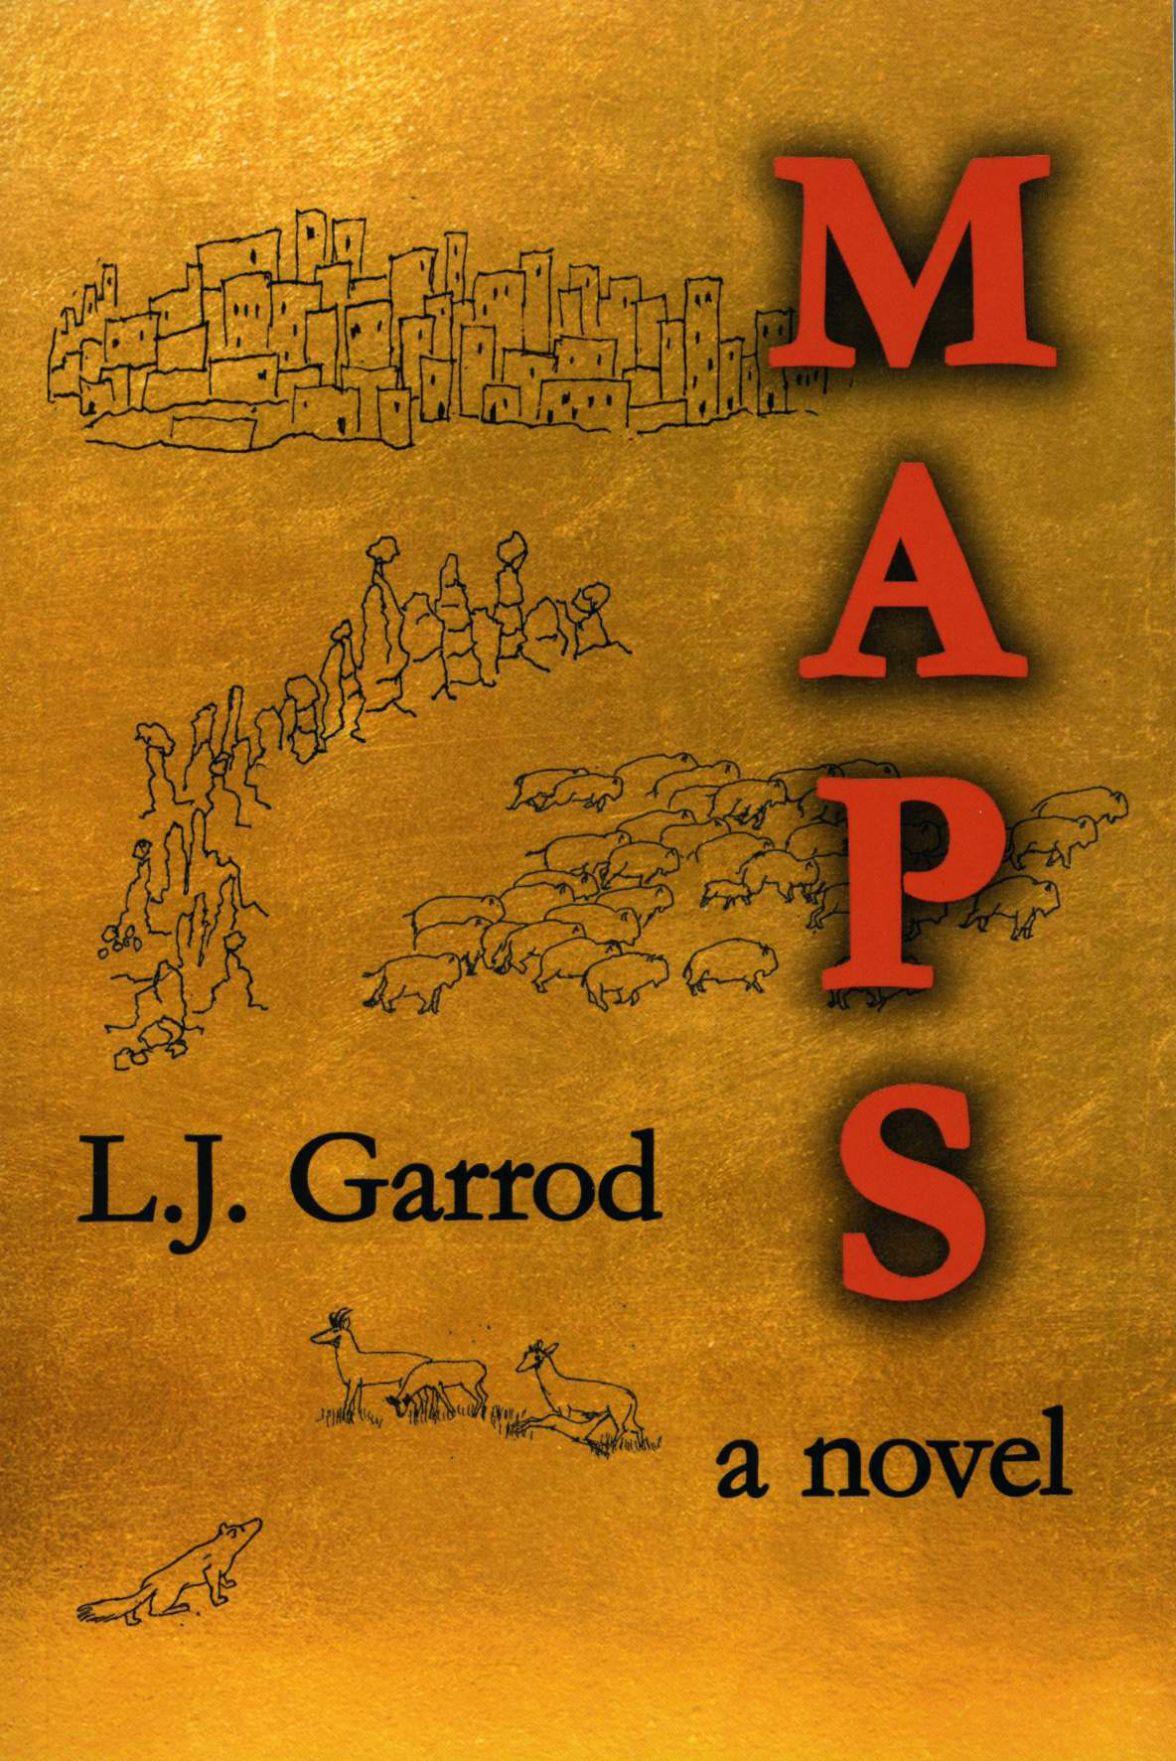 MAPS, a novel